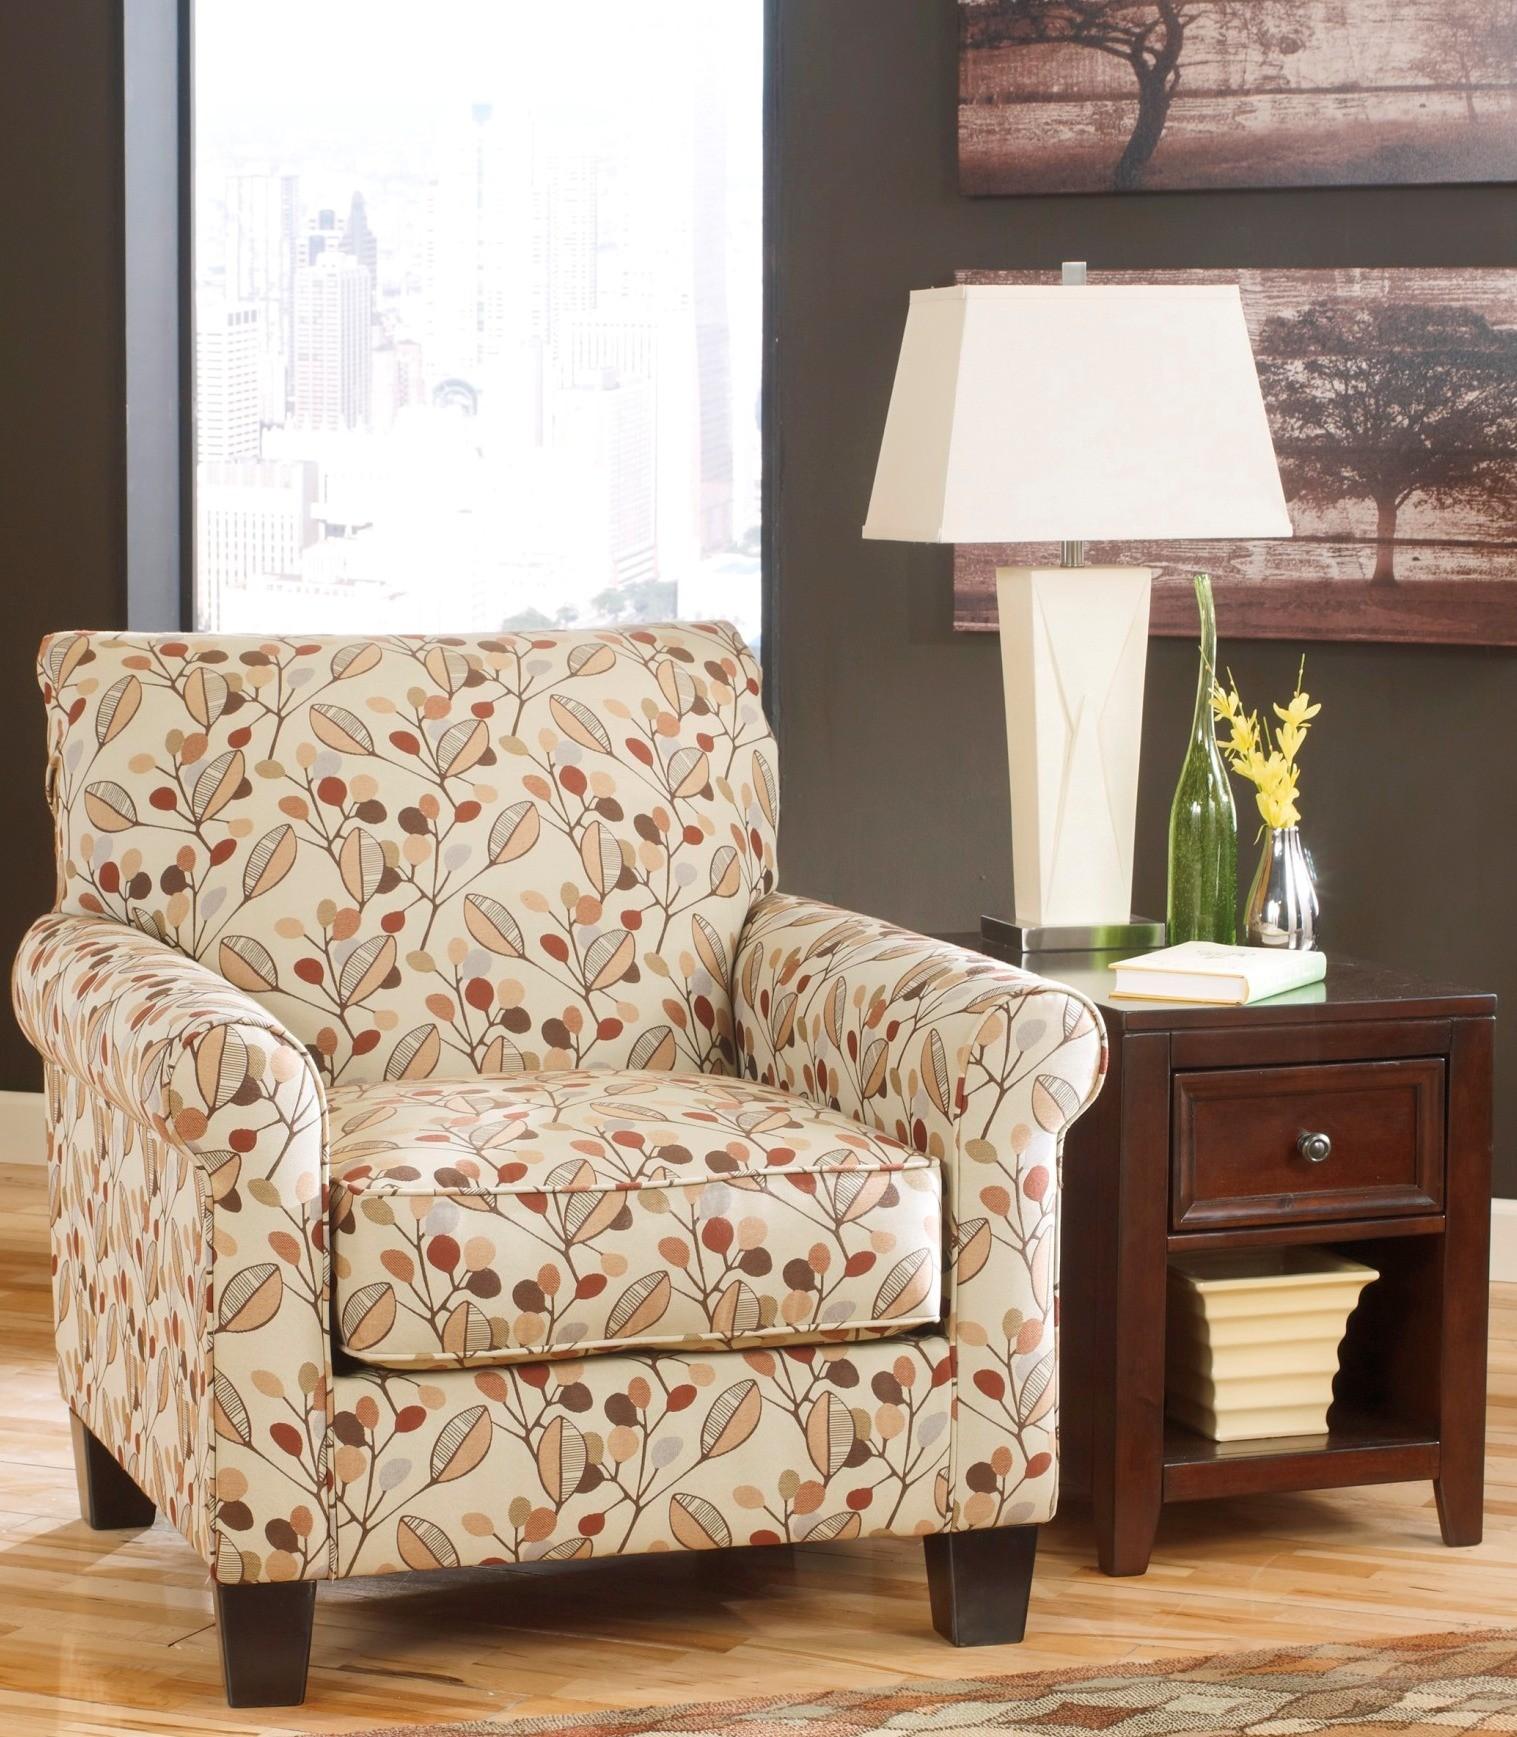 Danely Dusk Living Room Set From Ashley (35500)